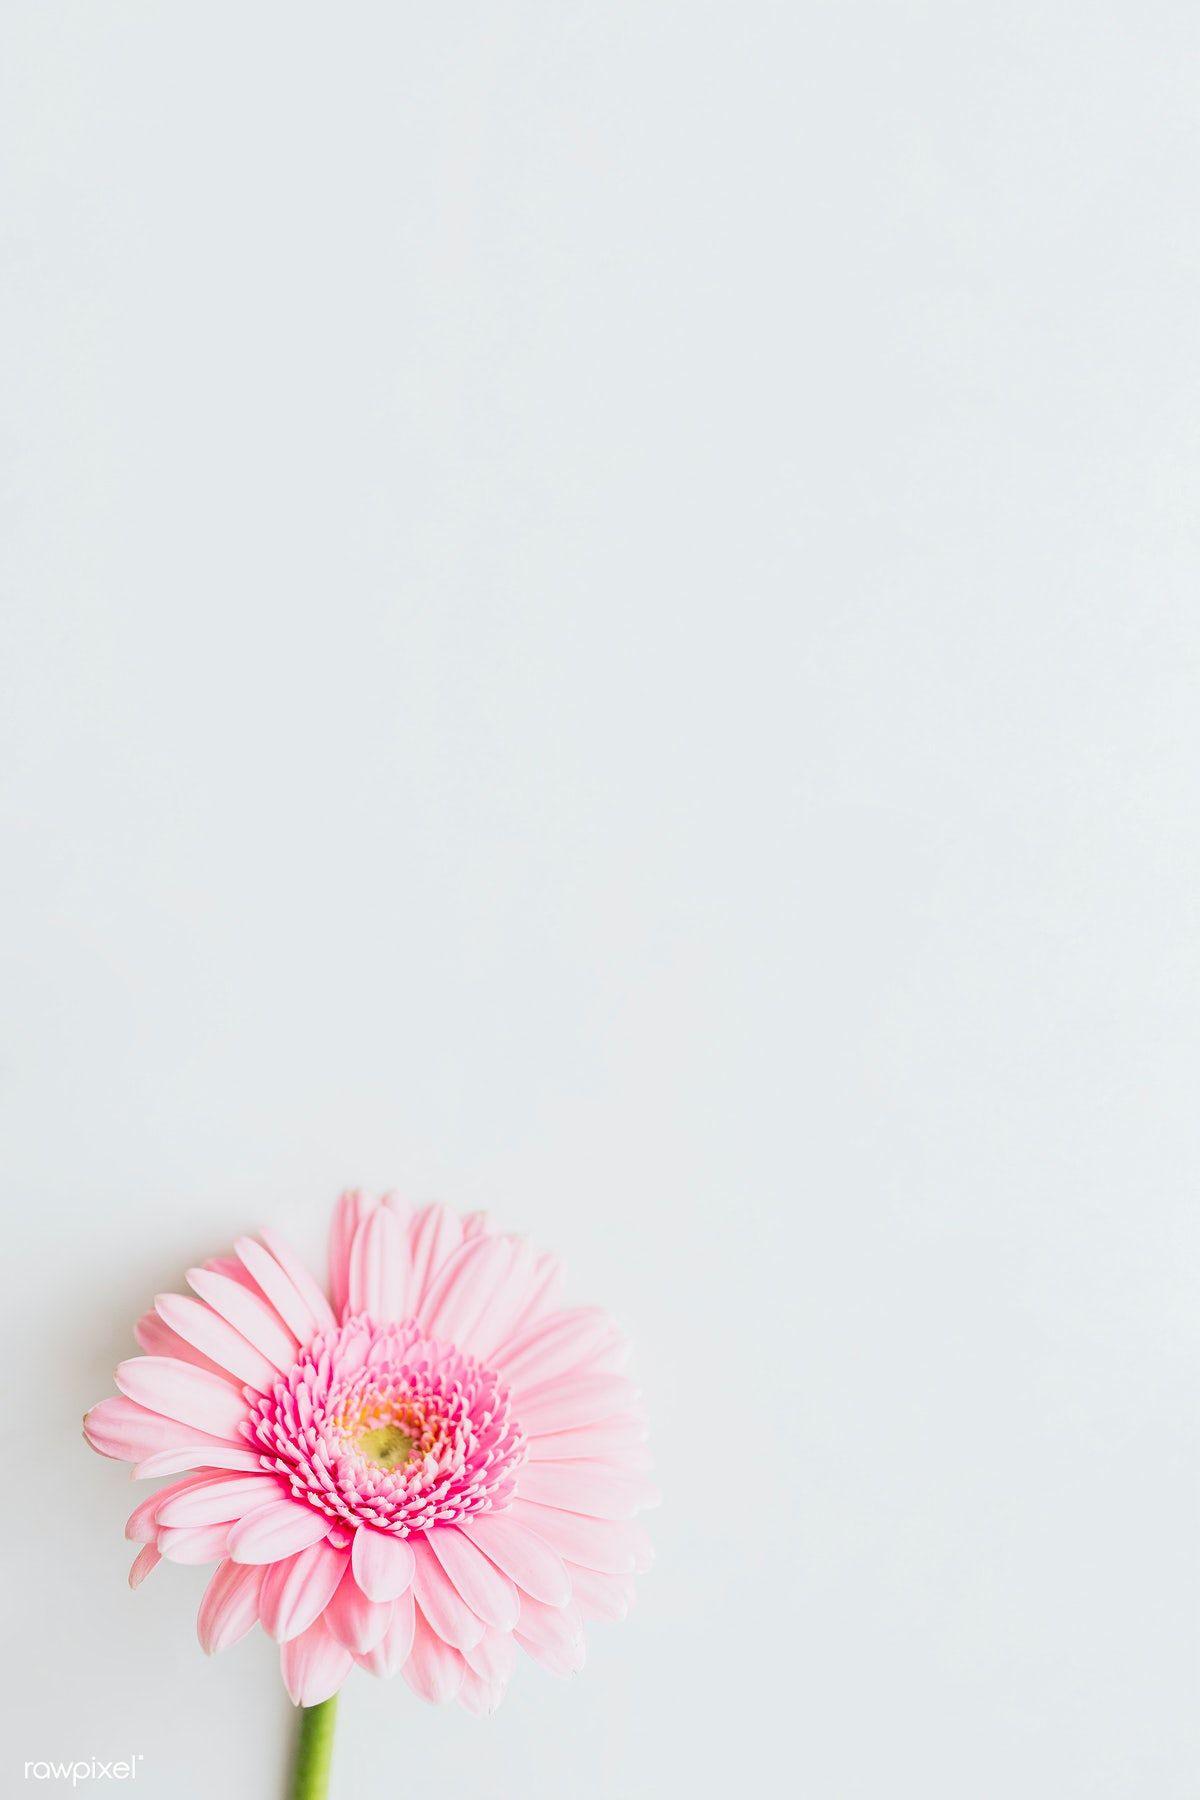 Single Light Pink Gerbera Daisy Flower On Gray Background Free Image By Rawpixel Com Karolina Kaboompics In 2020 Pink Gerbera Gerbera Flower Daisy Flower